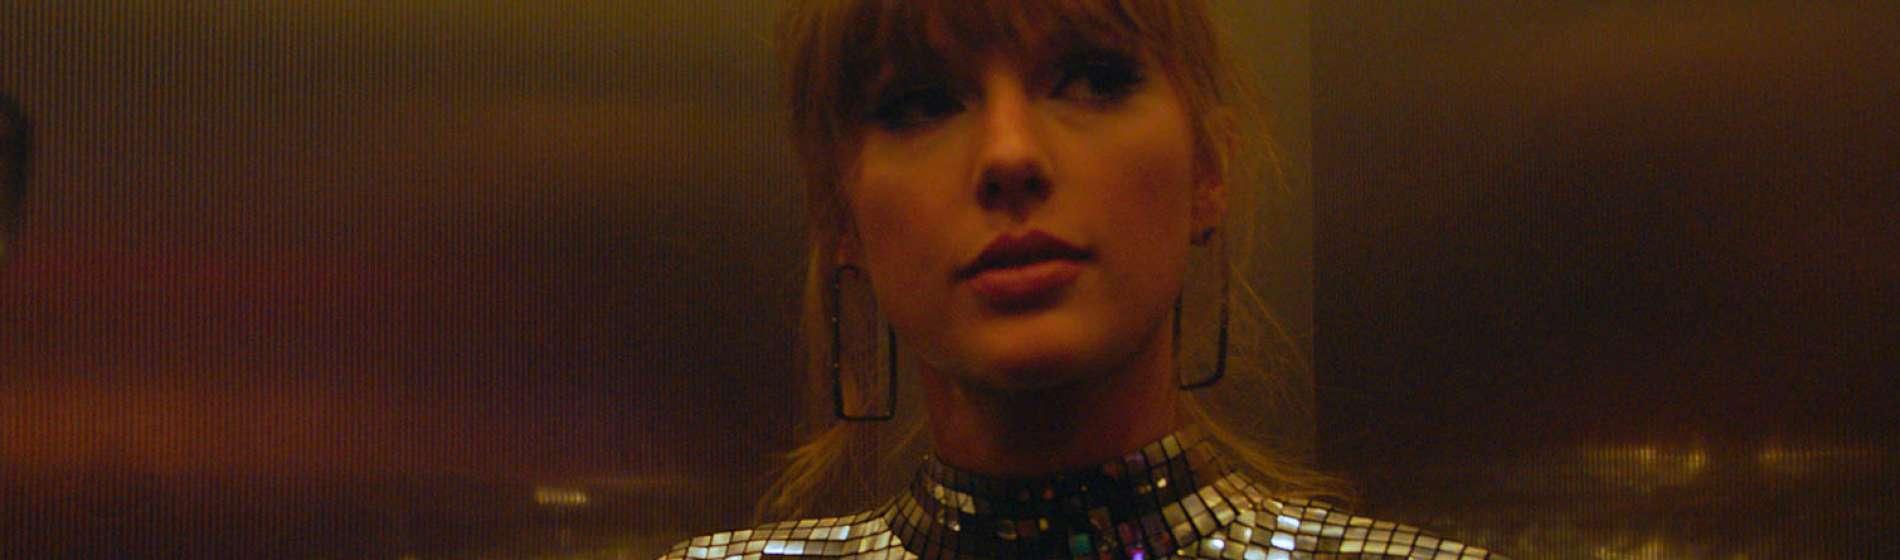 Taylor Swift: Miss Americana - Still 11